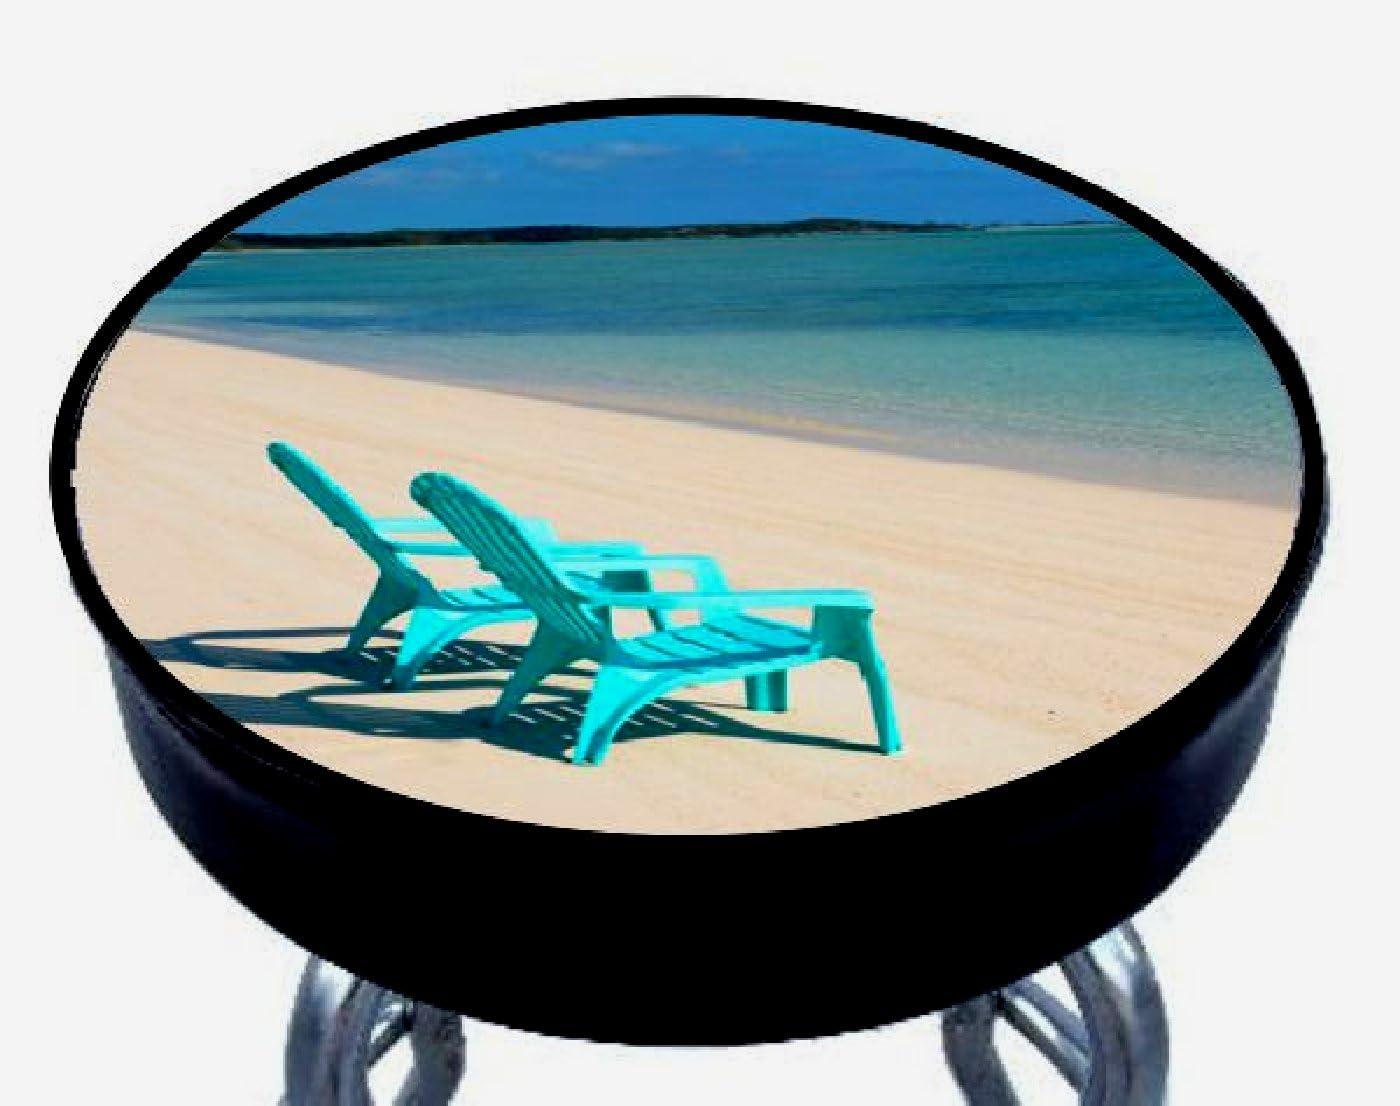 Max 74% OFF Custom Grafix Island Print #15 Slip-on Inc Bar 12-15 Cover Manufacturer regenerated product Stool